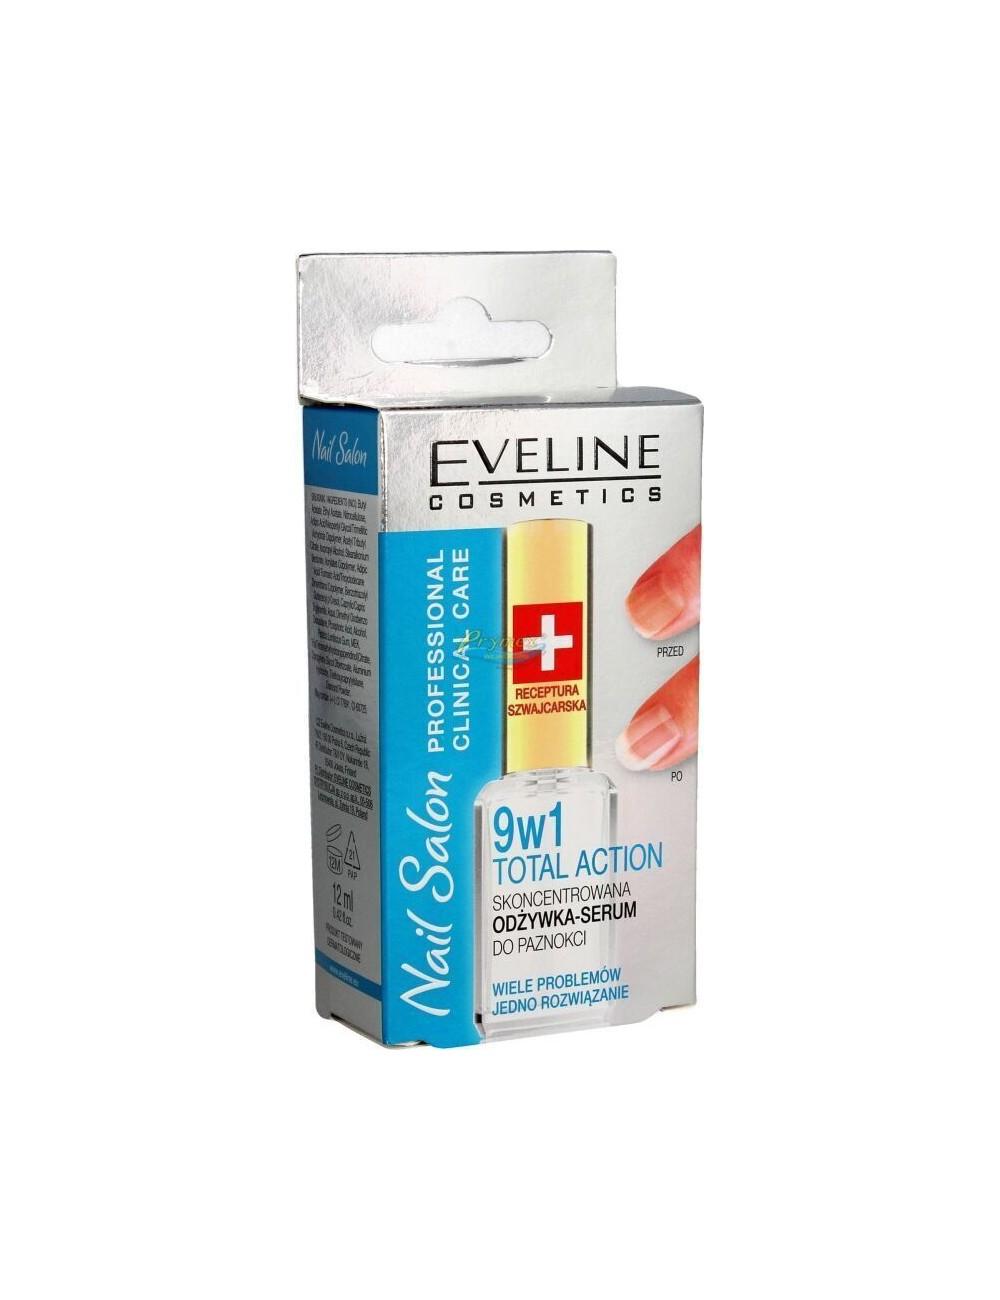 Eveline Nail Salon 9w1 Total Action Odżywka-Serum do Paznokci 12 ml